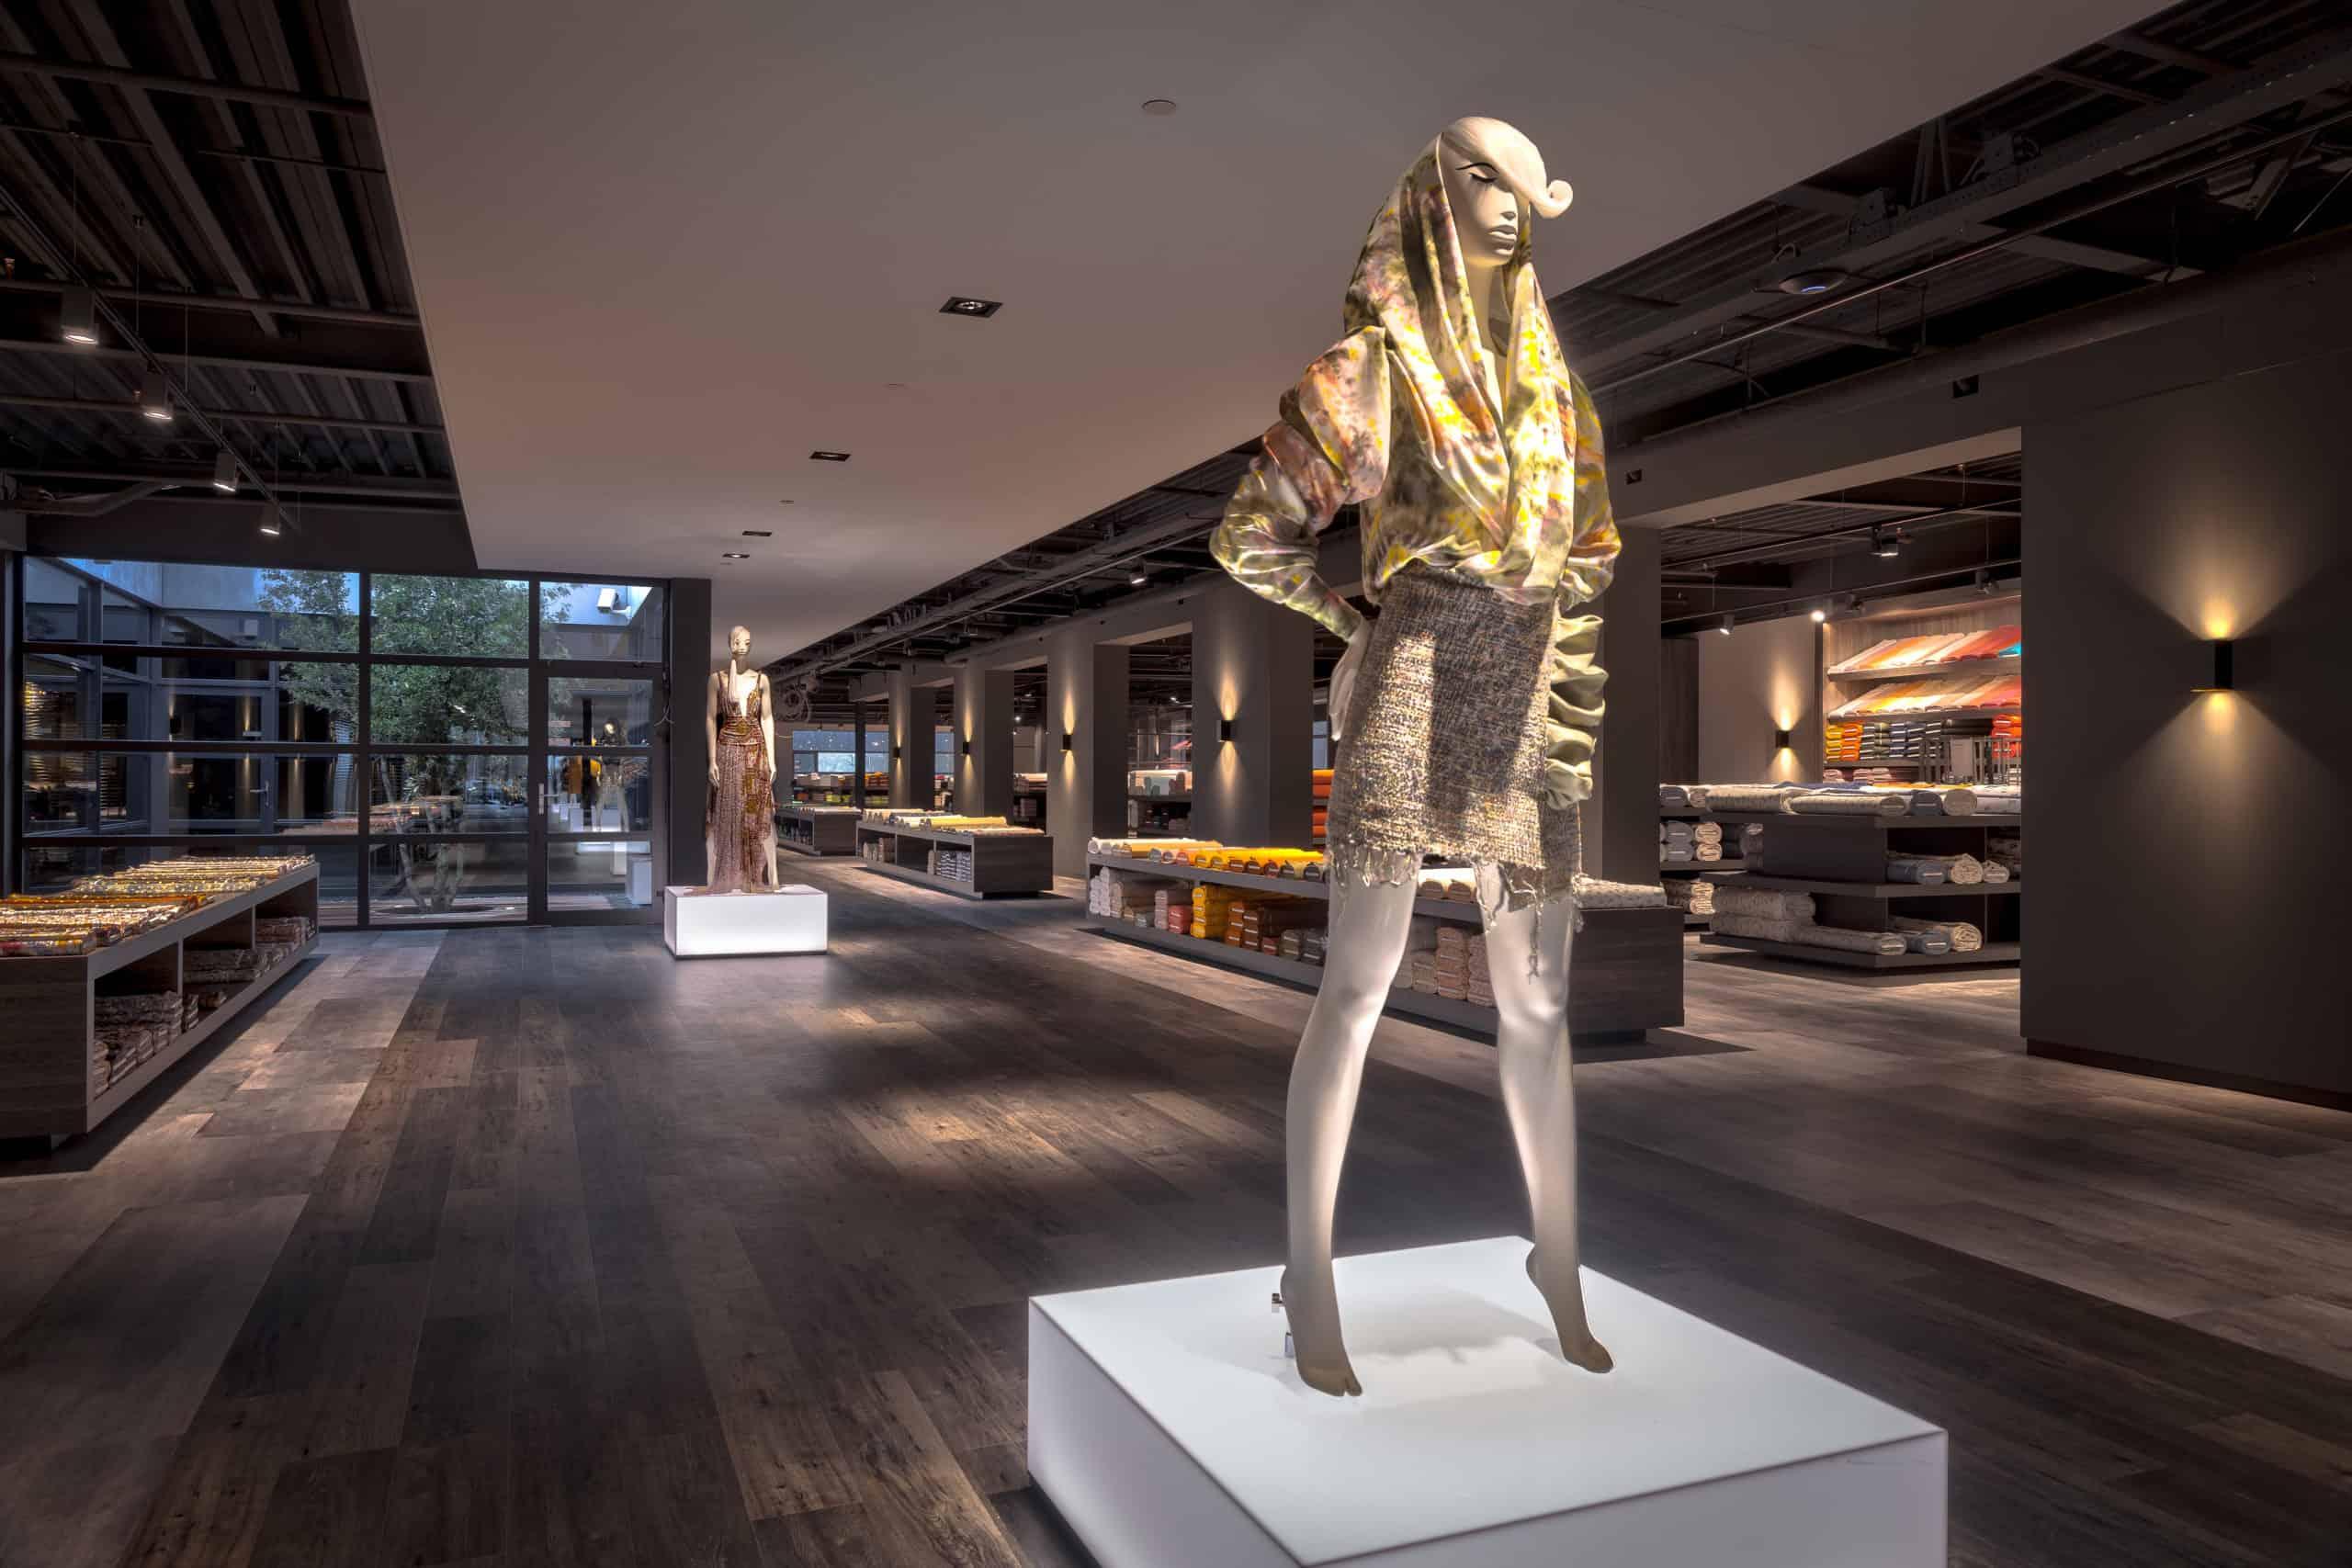 interieurarchitect Wildenberg ontwerp showroom Knipidee Almere figuren opbouwmateriaal licht wsb maretti iboma kerastone objectflor tarkett kopie